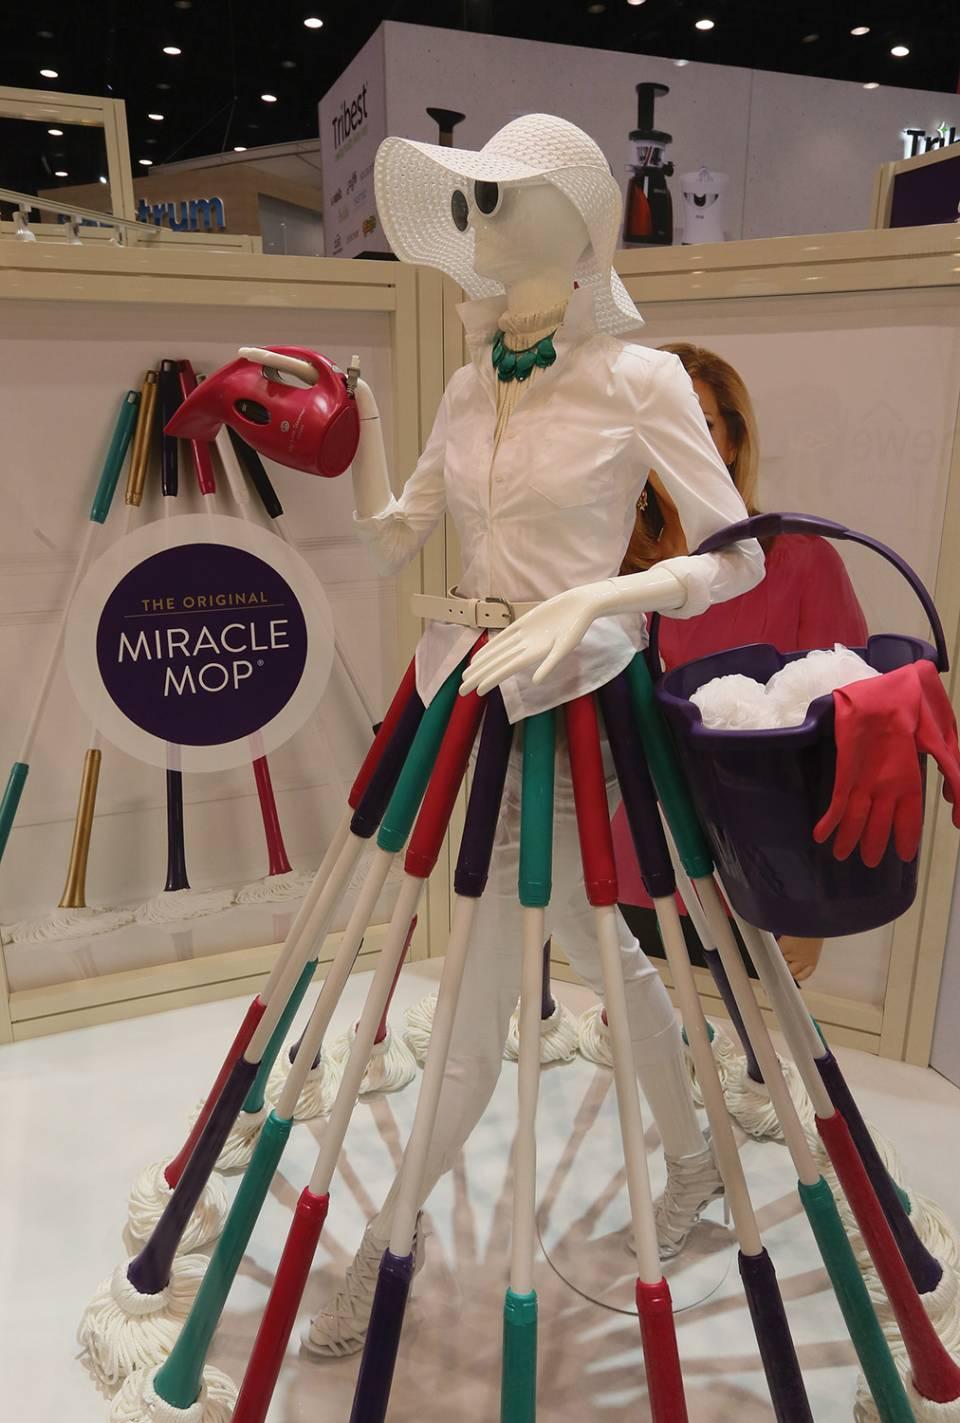 Quell pfiffiger Ideen: Die International Home + Housewares Show, Chicago.